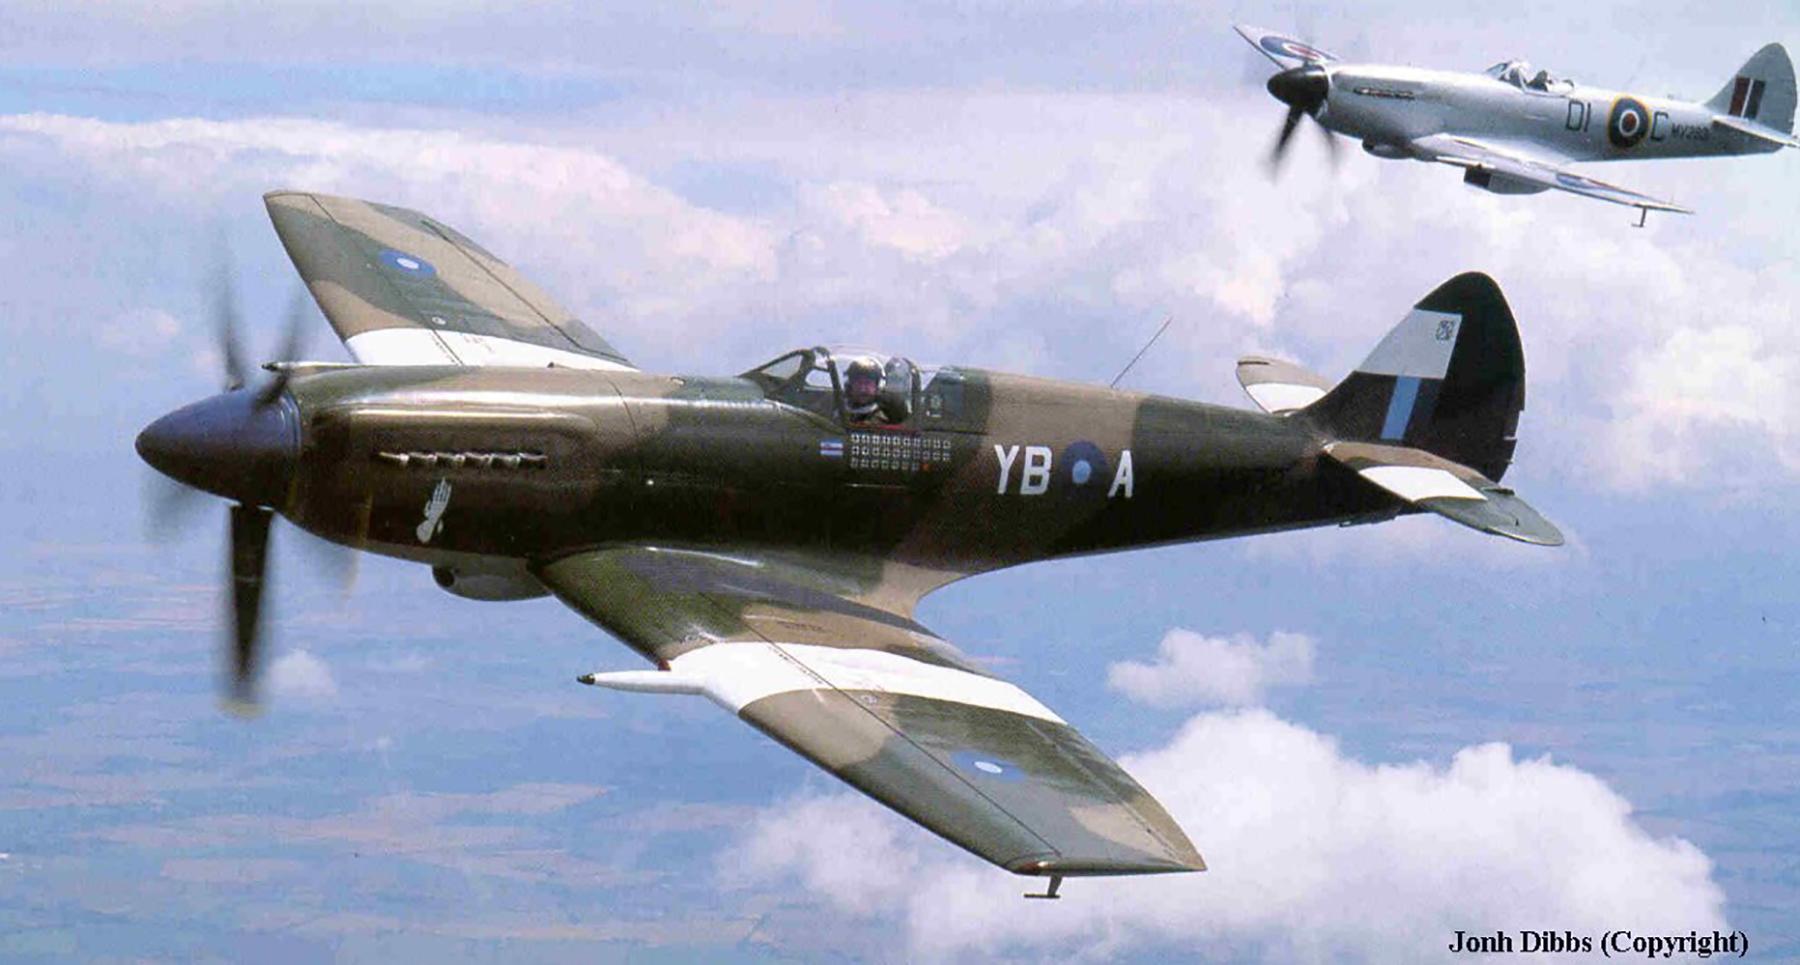 Airworthy Spitfire warbird RAF 17Sqn YBA SM832 05